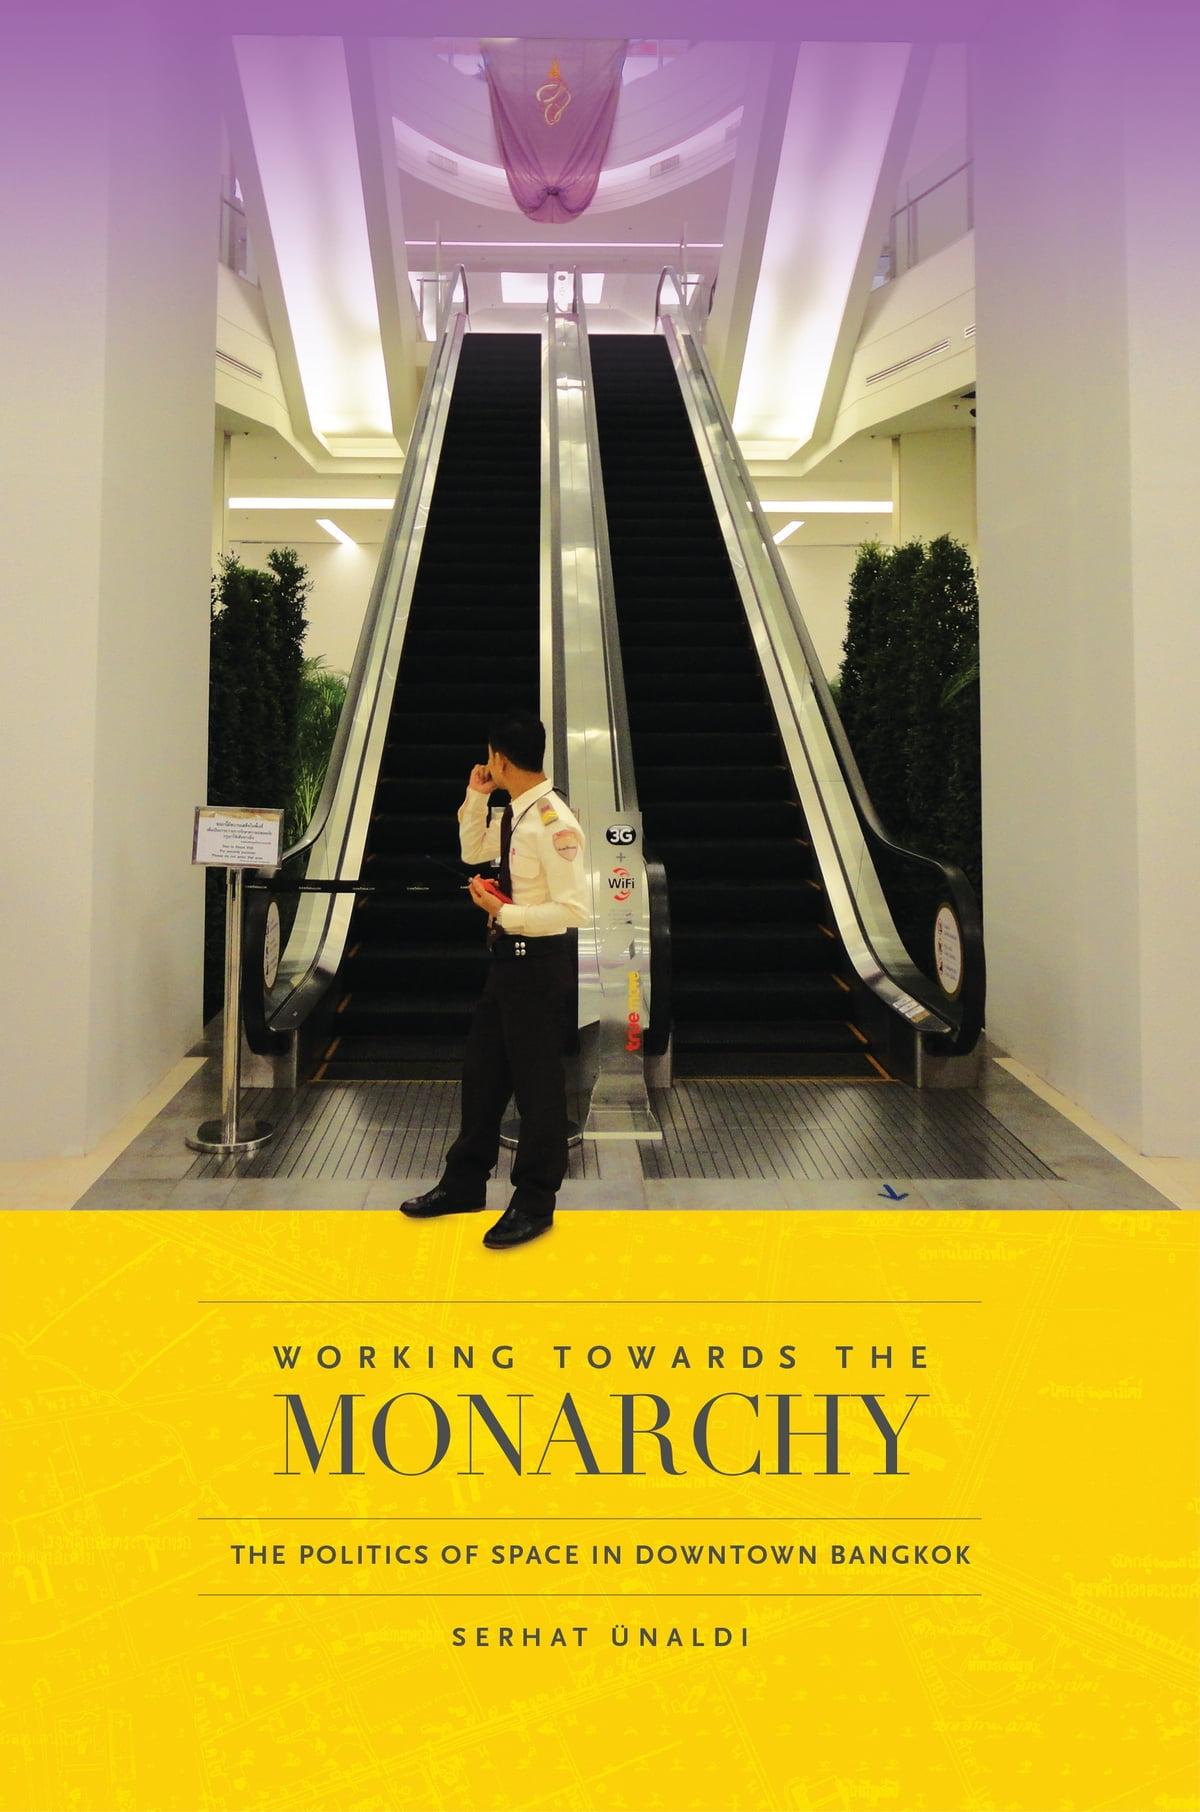 Working towards the Monarchy   Rakuten Kobo Australia